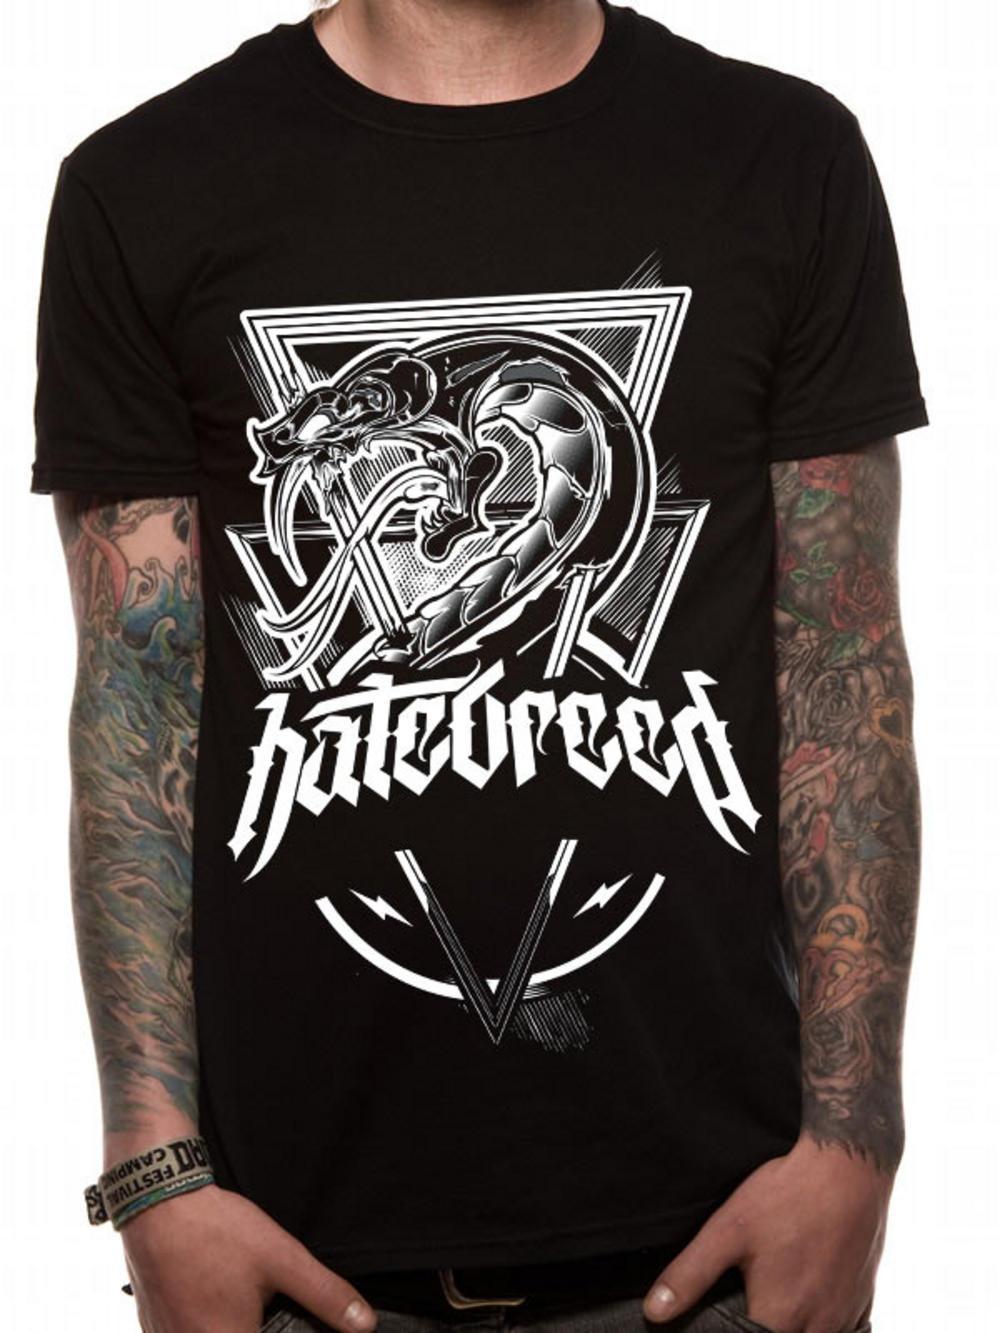 Hatebreed (Venom) T-shirt. Buy Hatebreed (Venom) T-shirt at